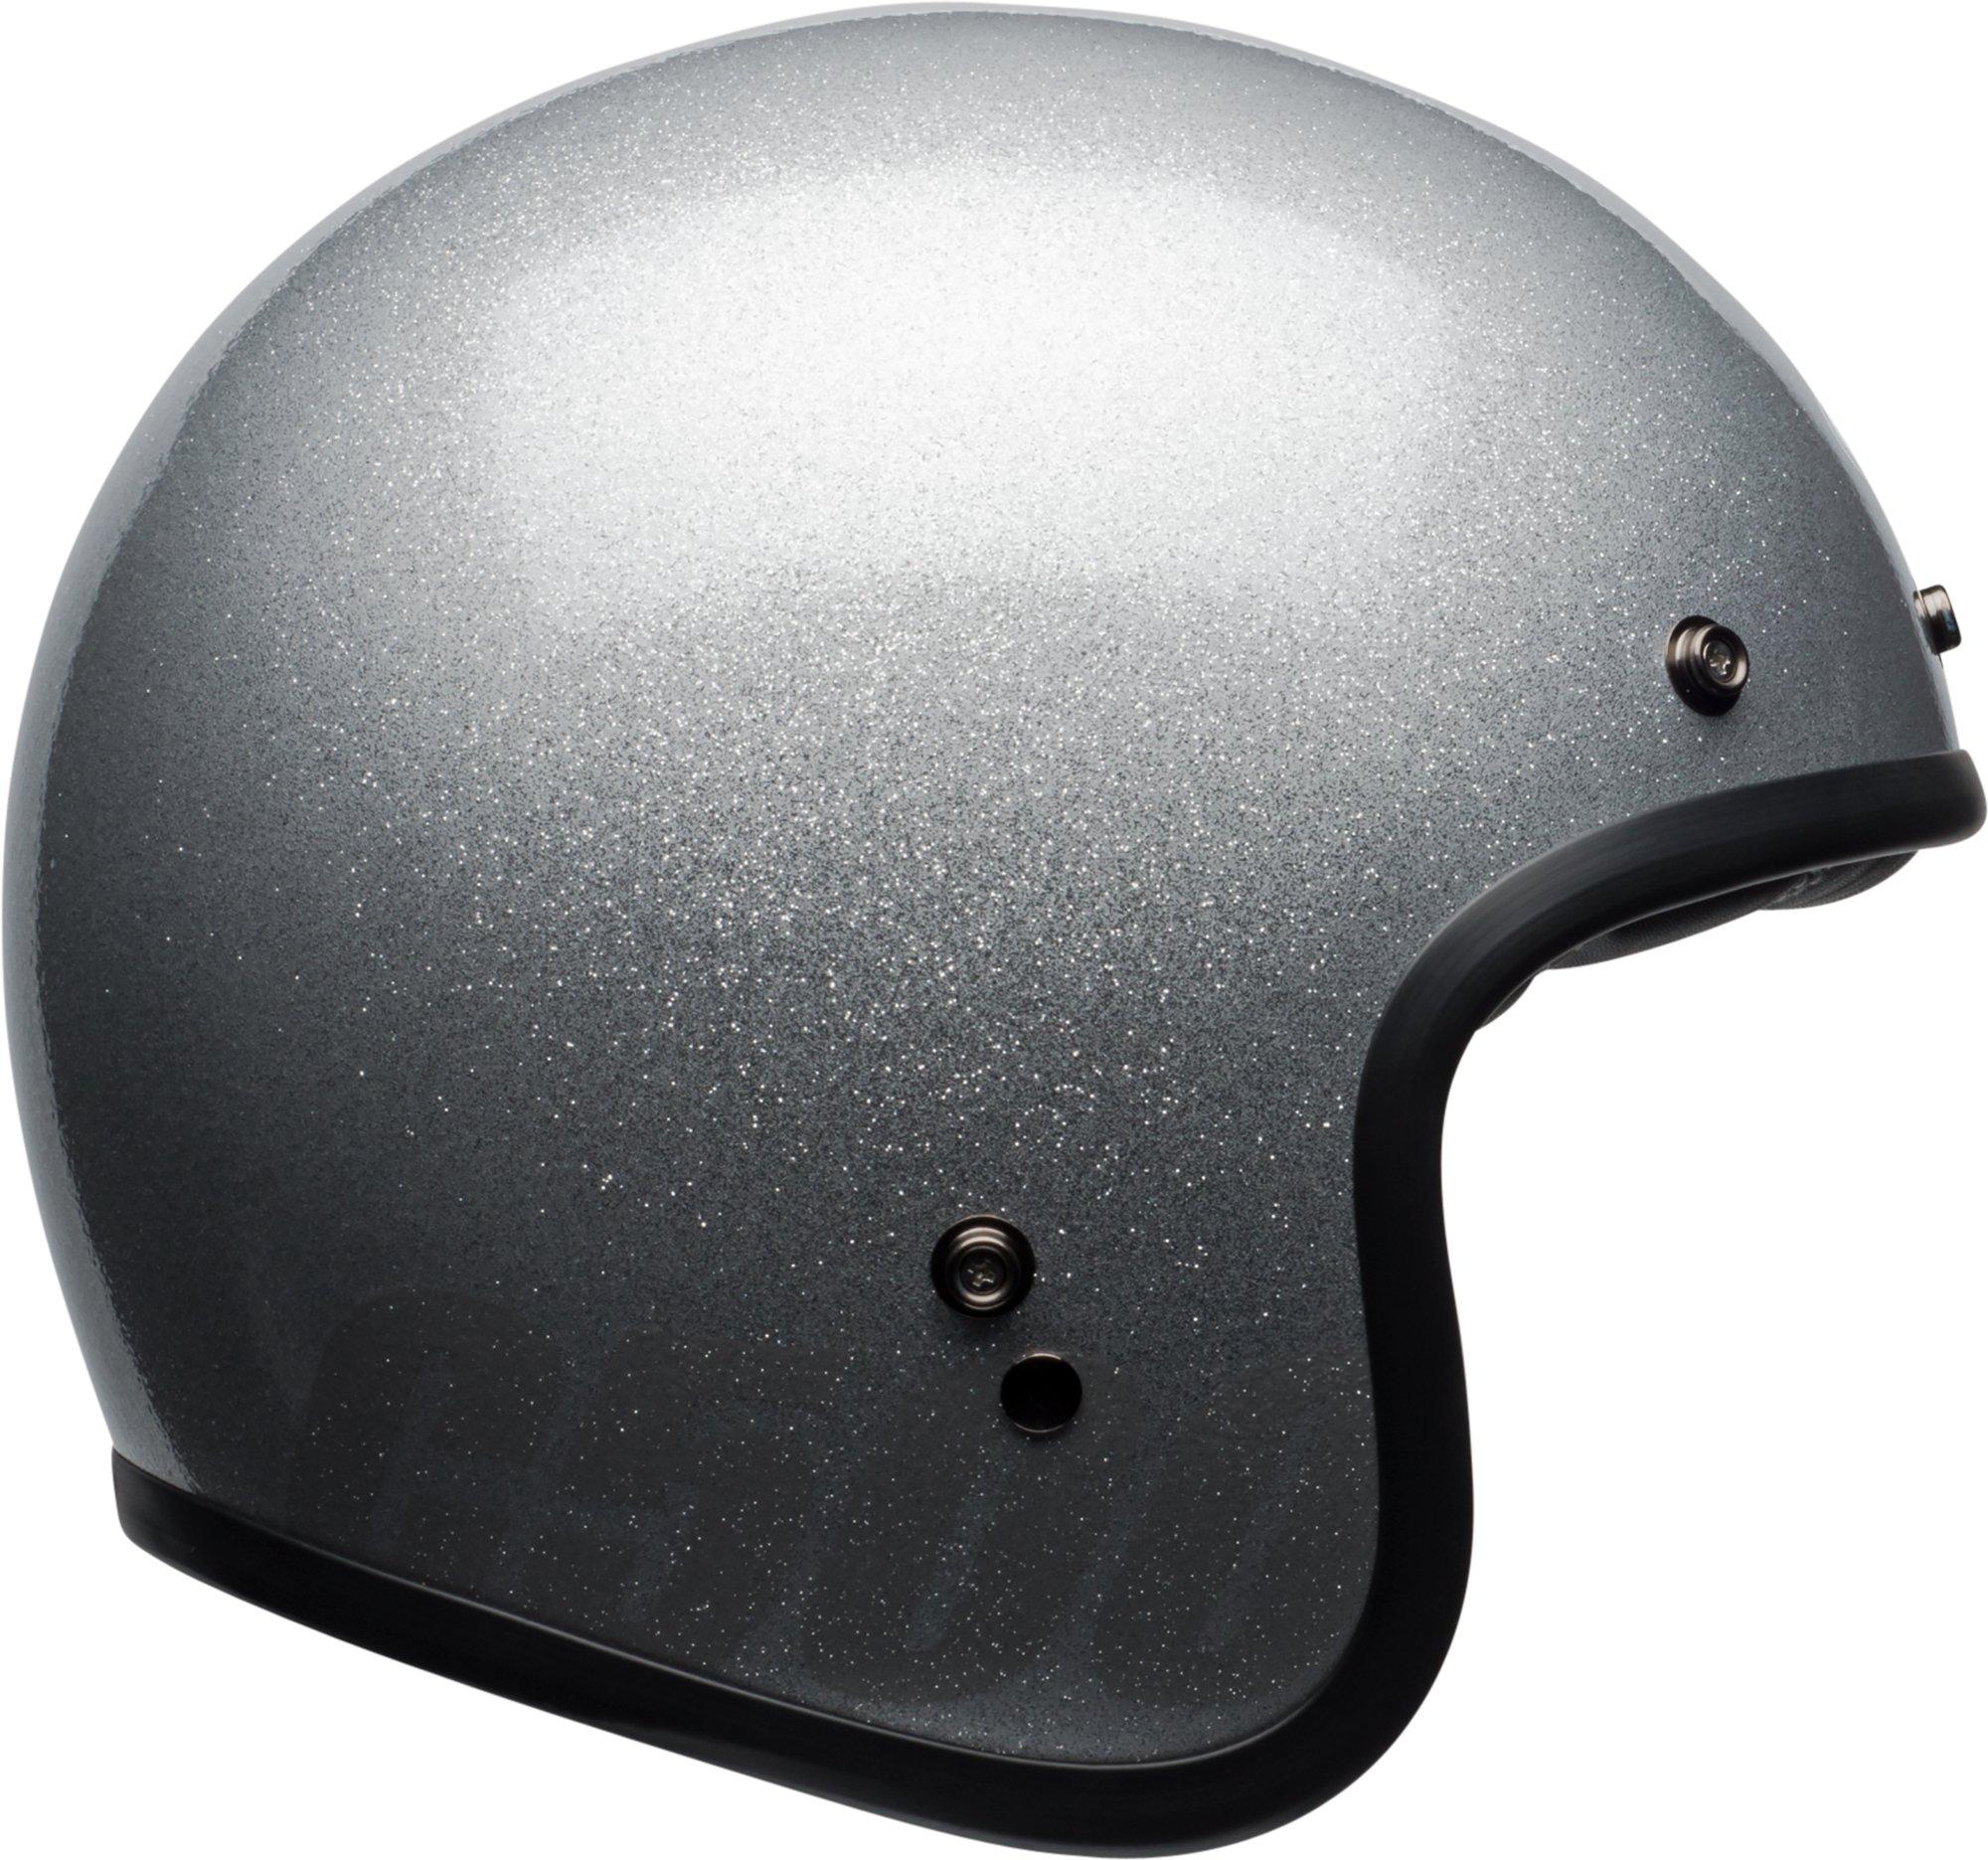 Bell Custom 500 Classic Helmet - Gloss Silver Flake - Medium